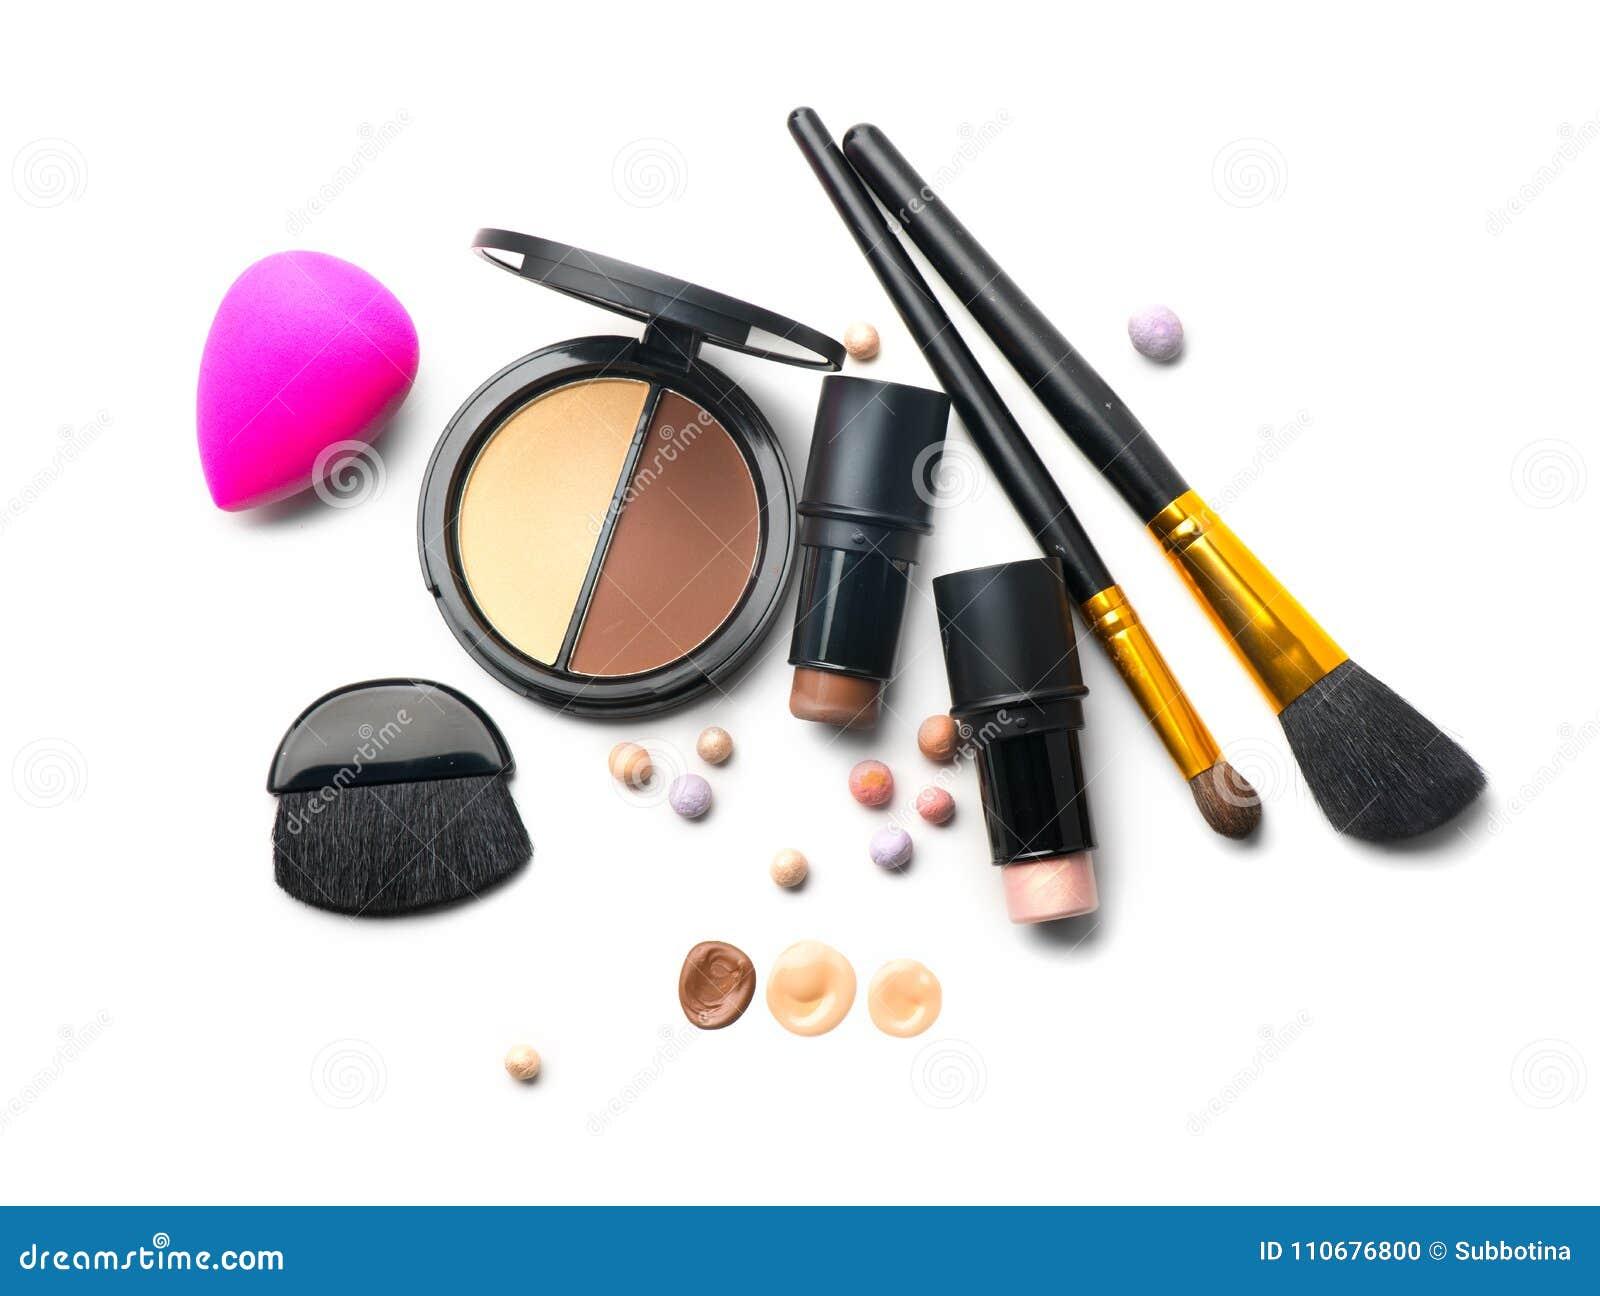 makeup contour products make up artist tools face contouring make